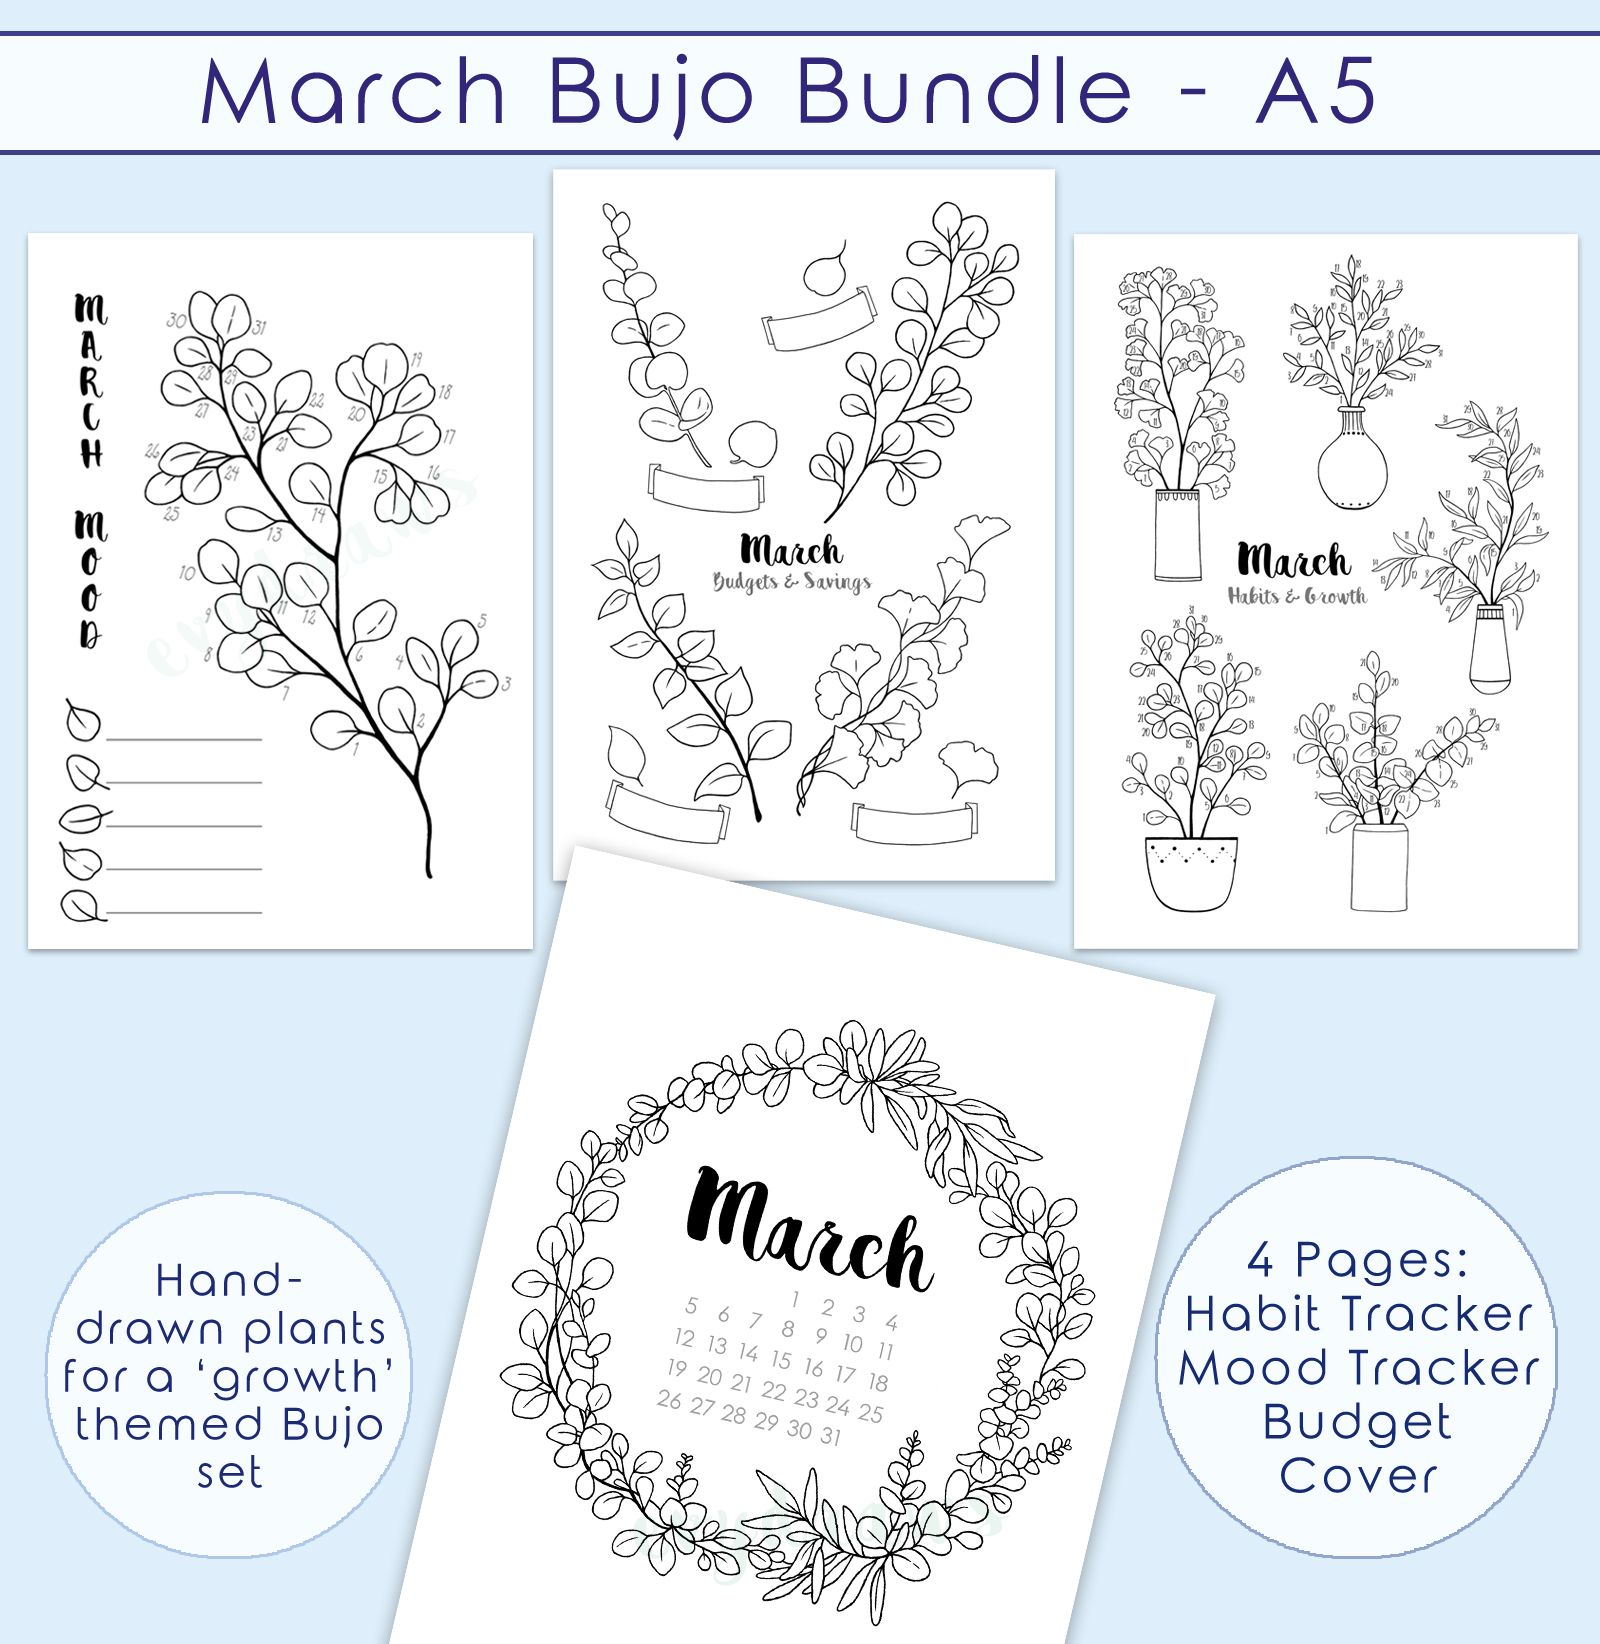 march-bujo-journal-kit.jpg